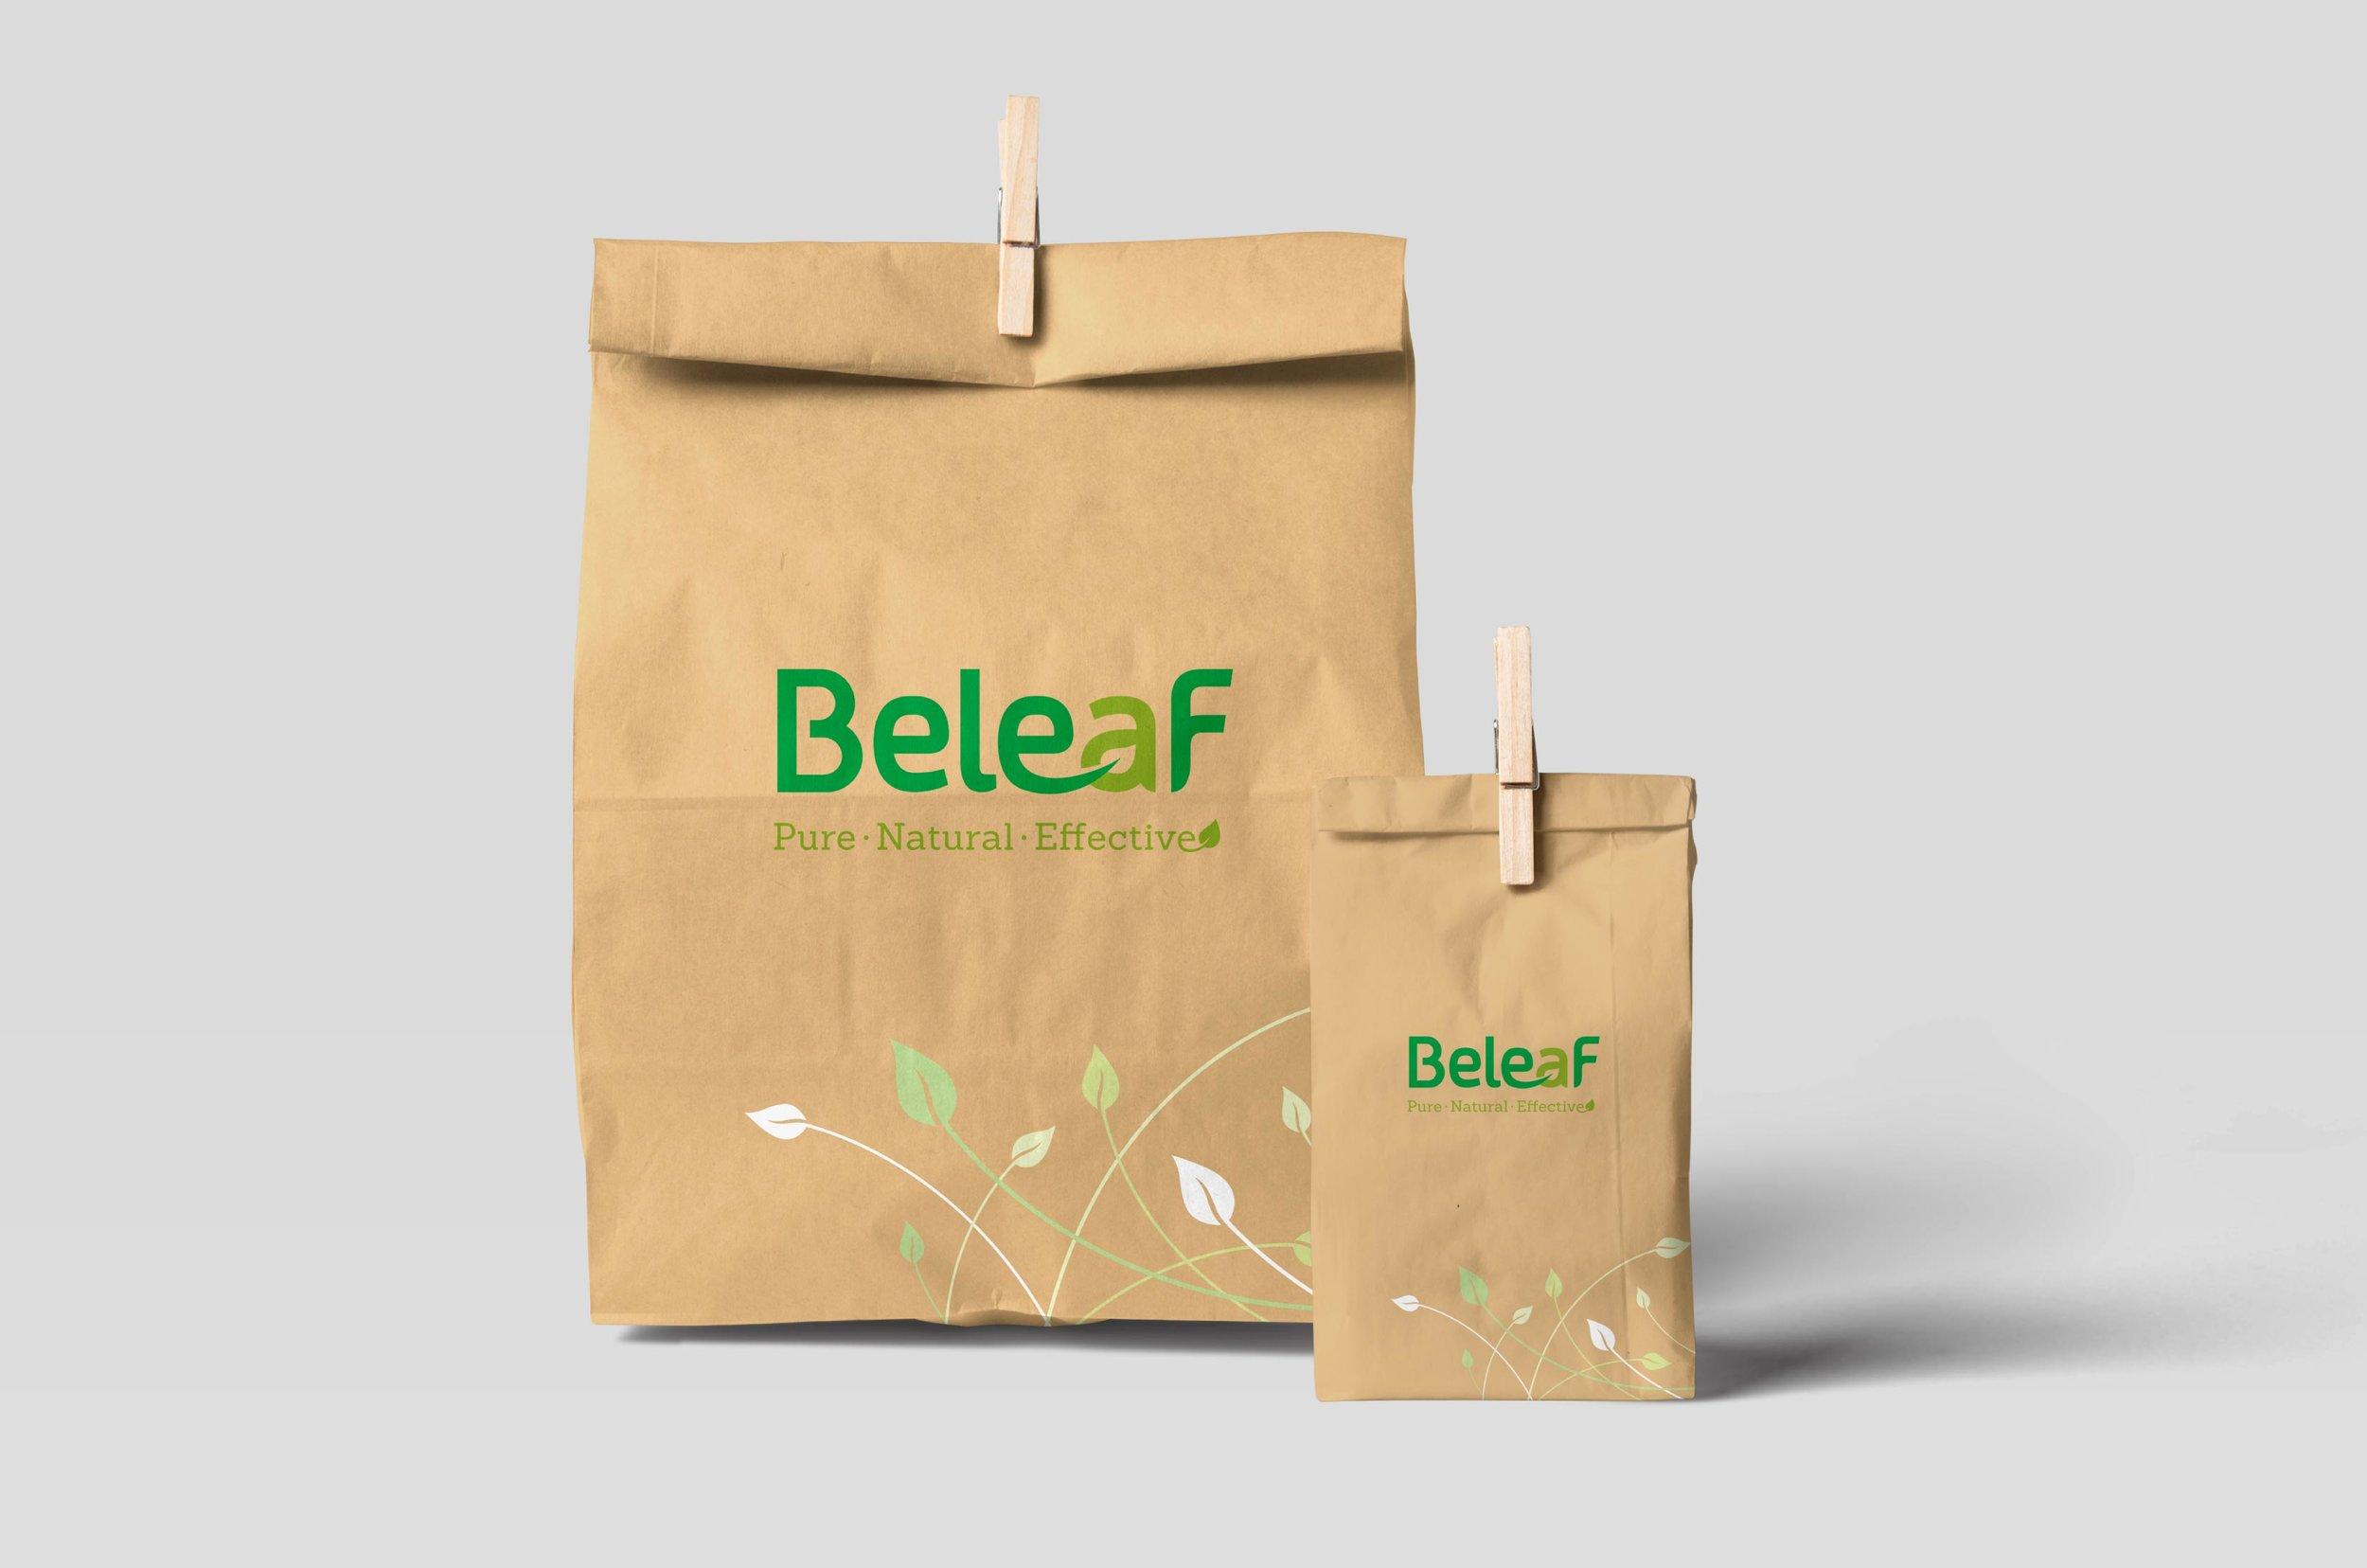 Beleaf_Branding_Elephant Design 5.jpg